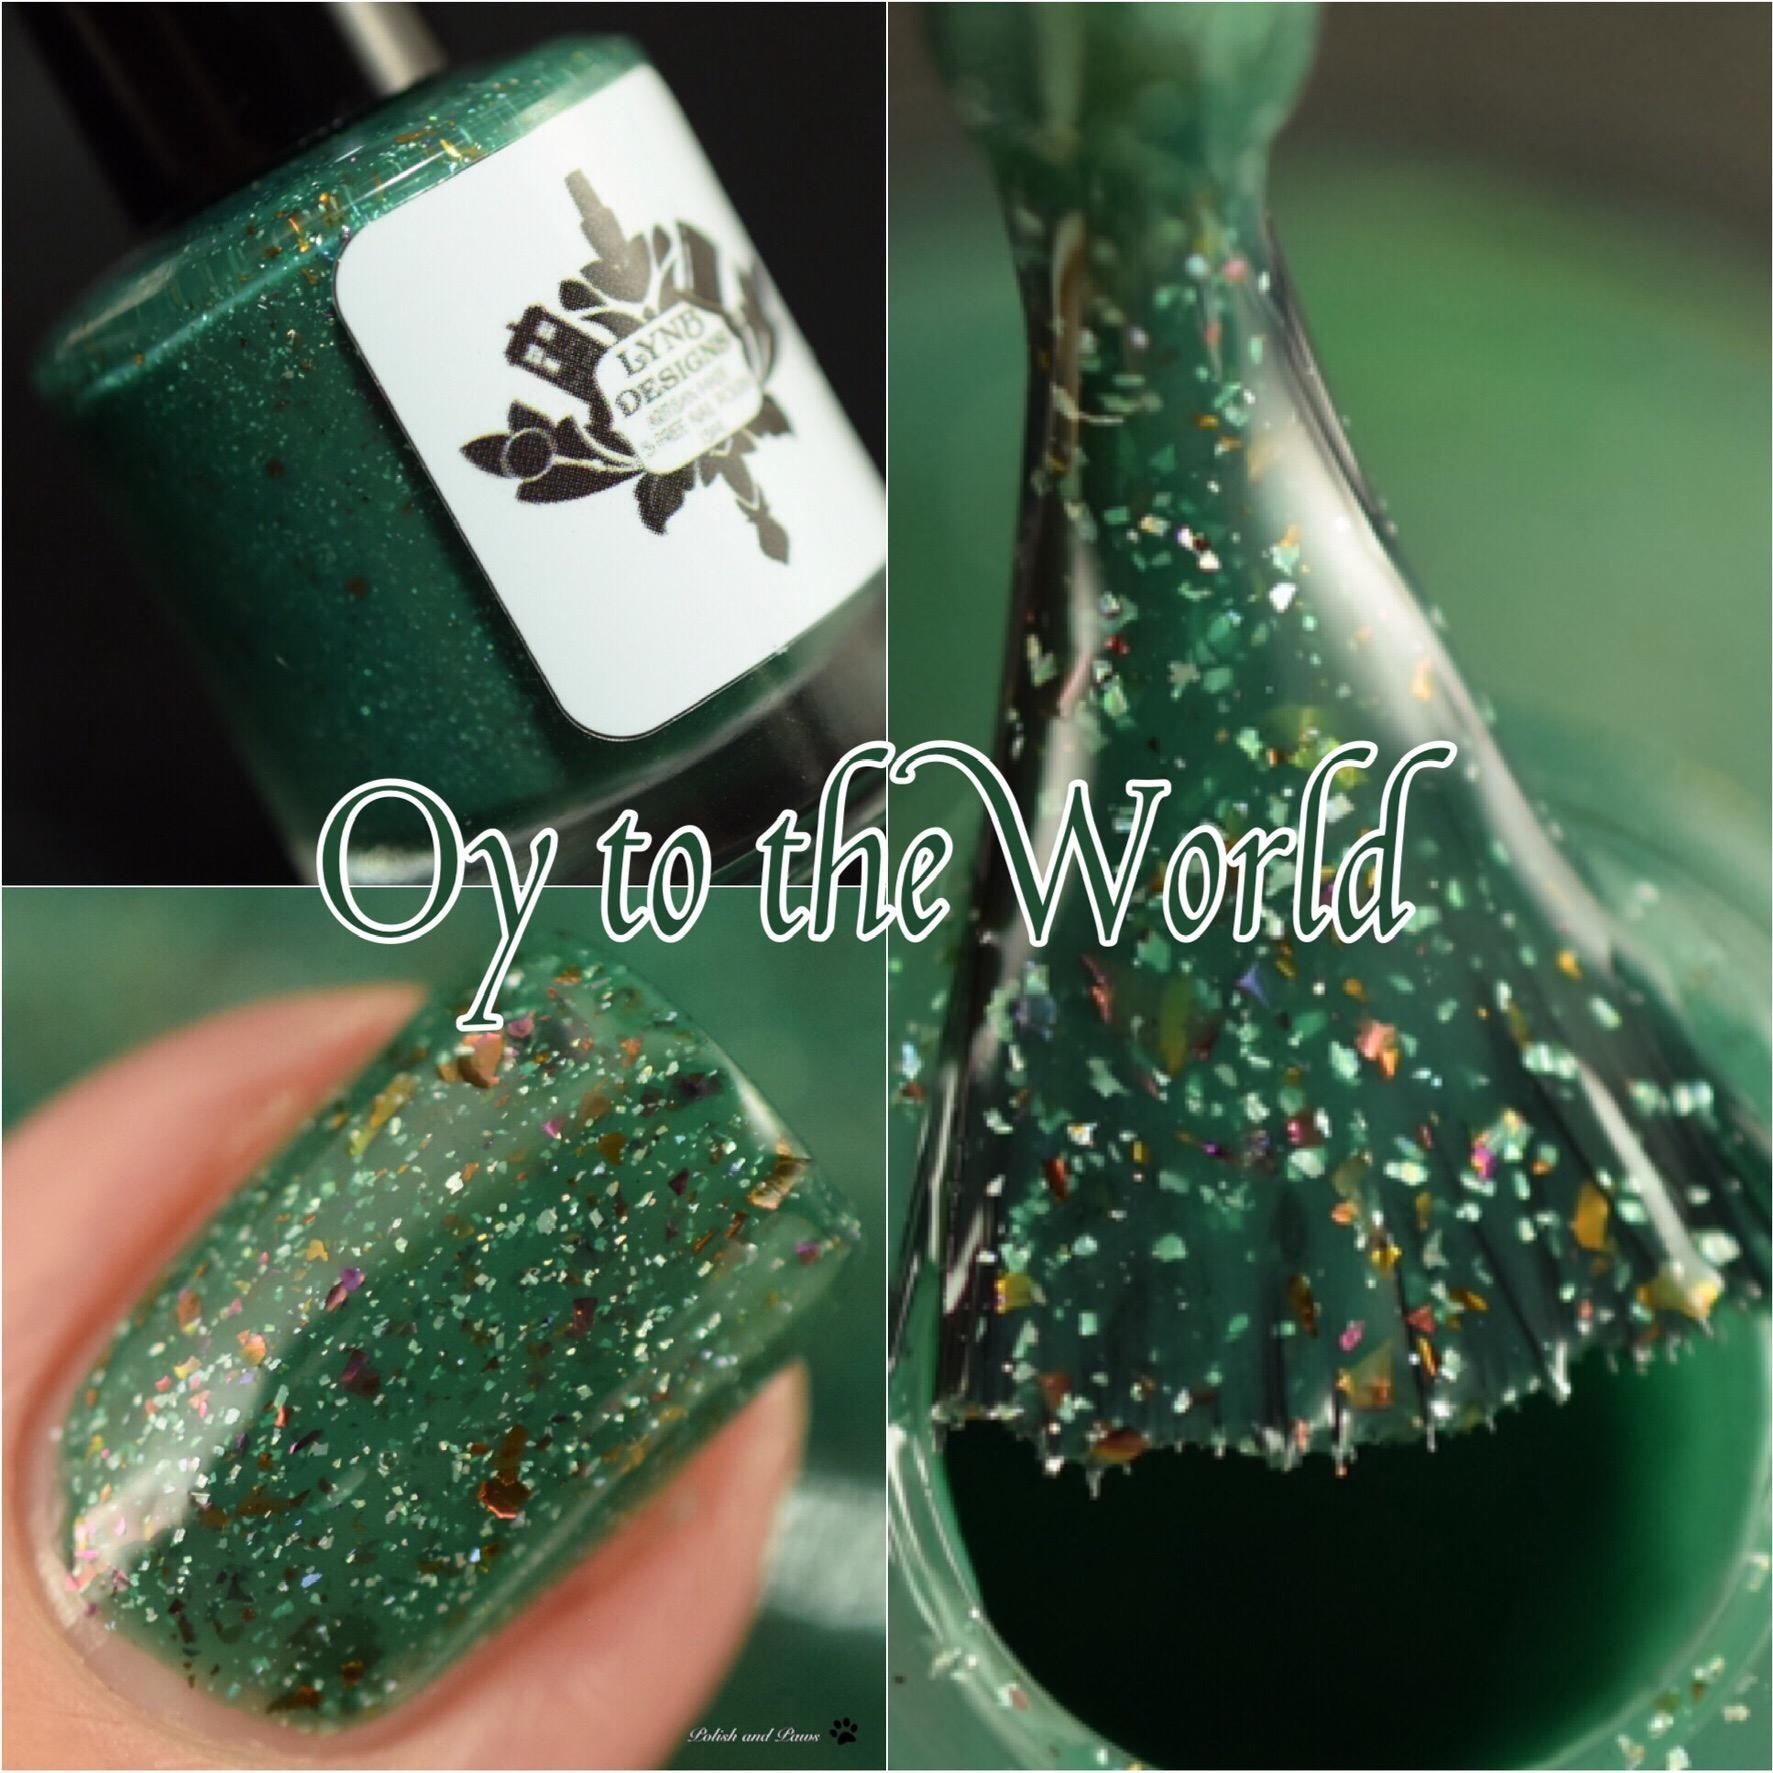 LynB Designs Oy to the World